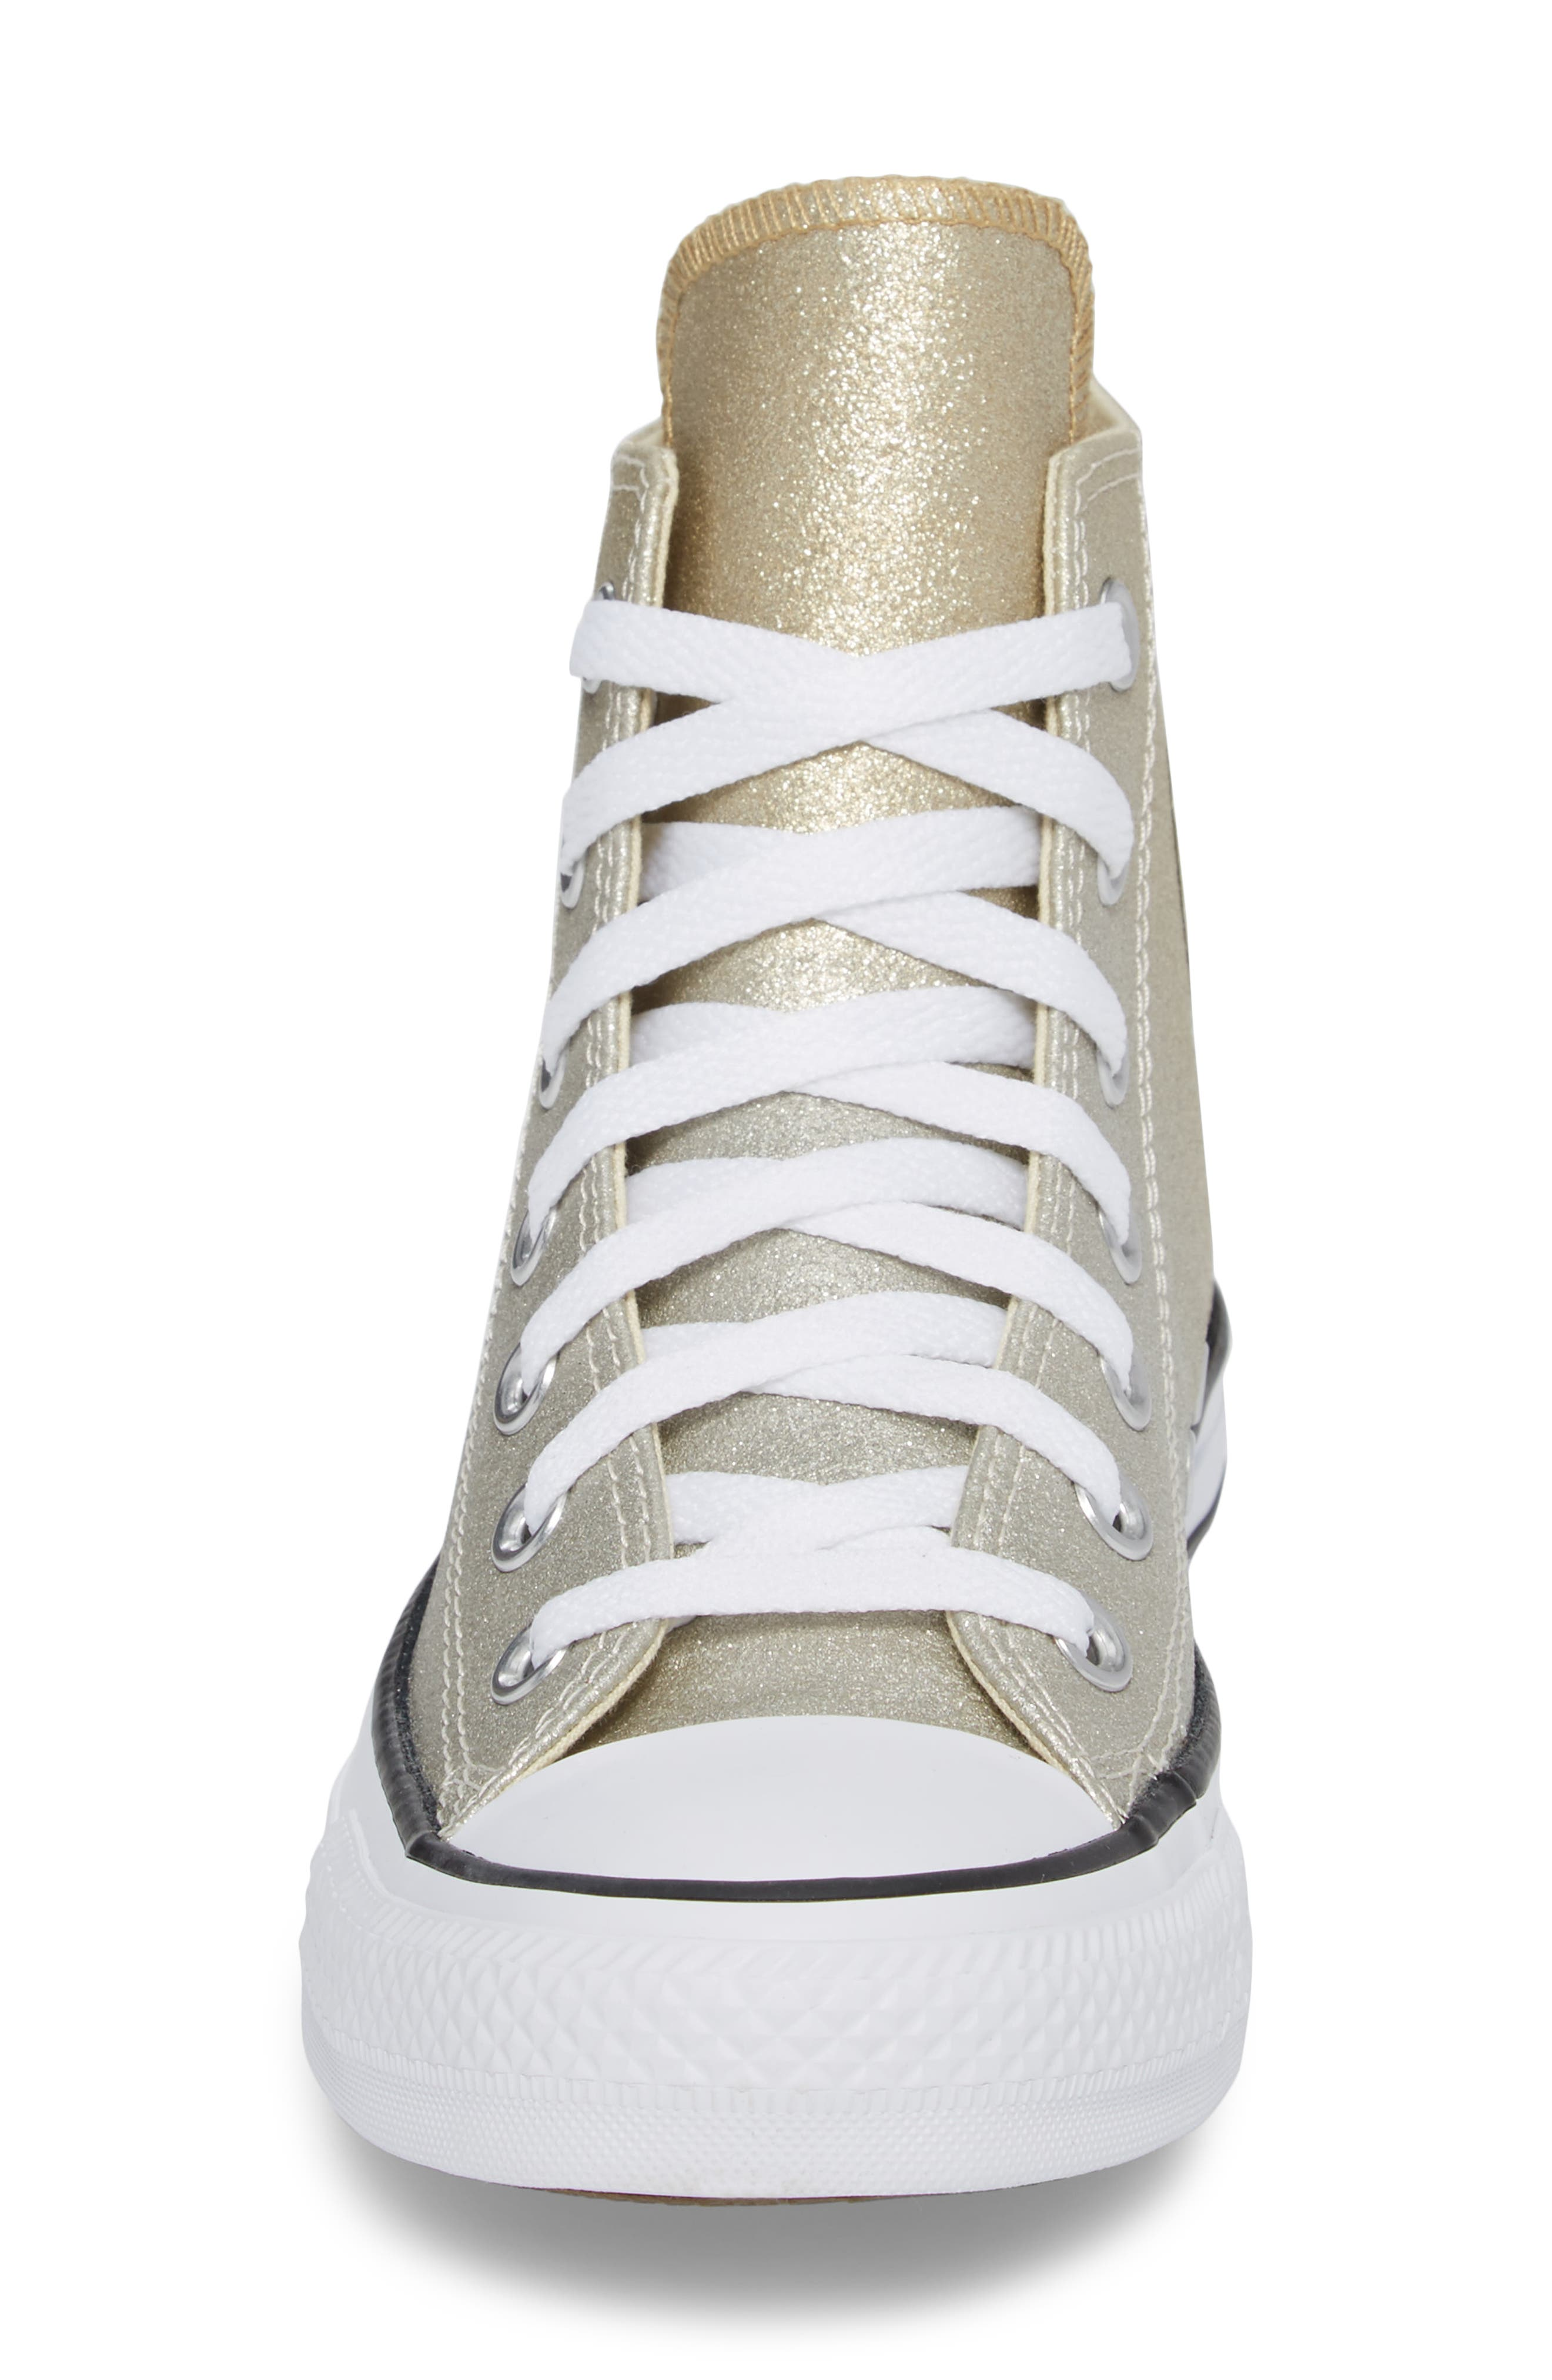 CONVERSE,                             Chuck Taylor<sup>®</sup> All Star<sup>®</sup> Ombré Metallic High Top Sneaker,                             Alternate thumbnail 4, color,                             710